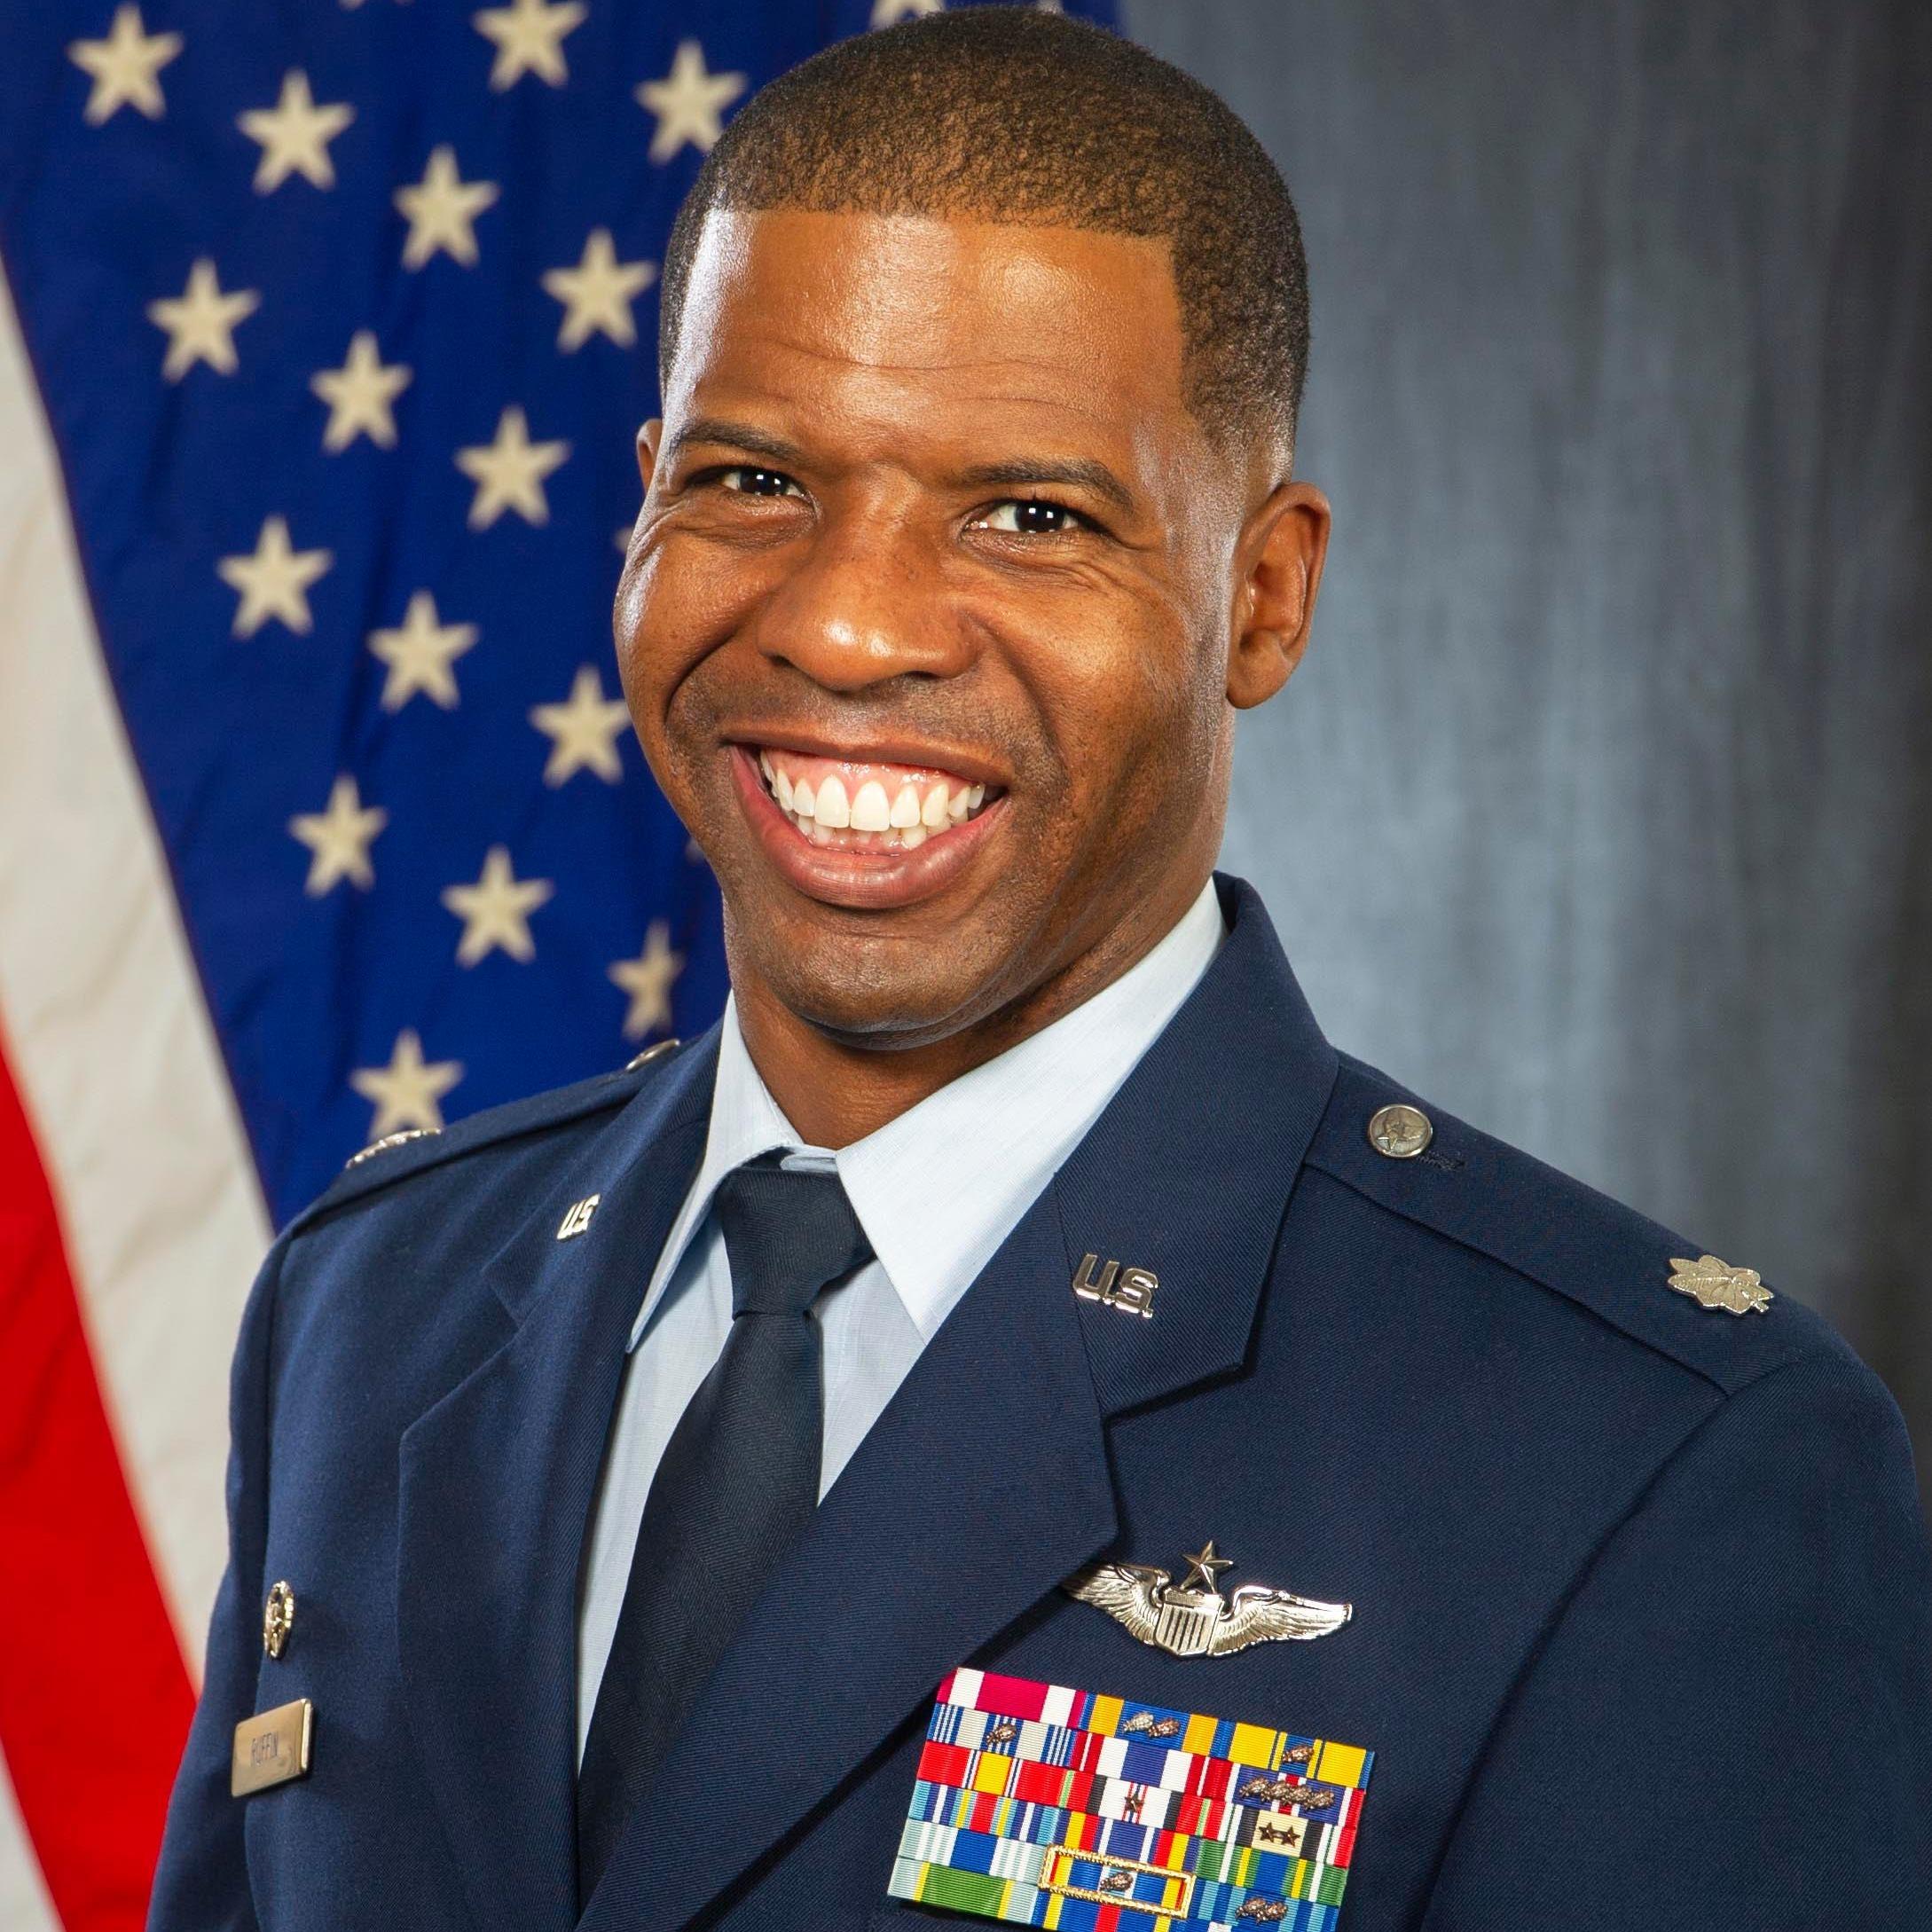 Lt. Col. Kenyatta Ruffin